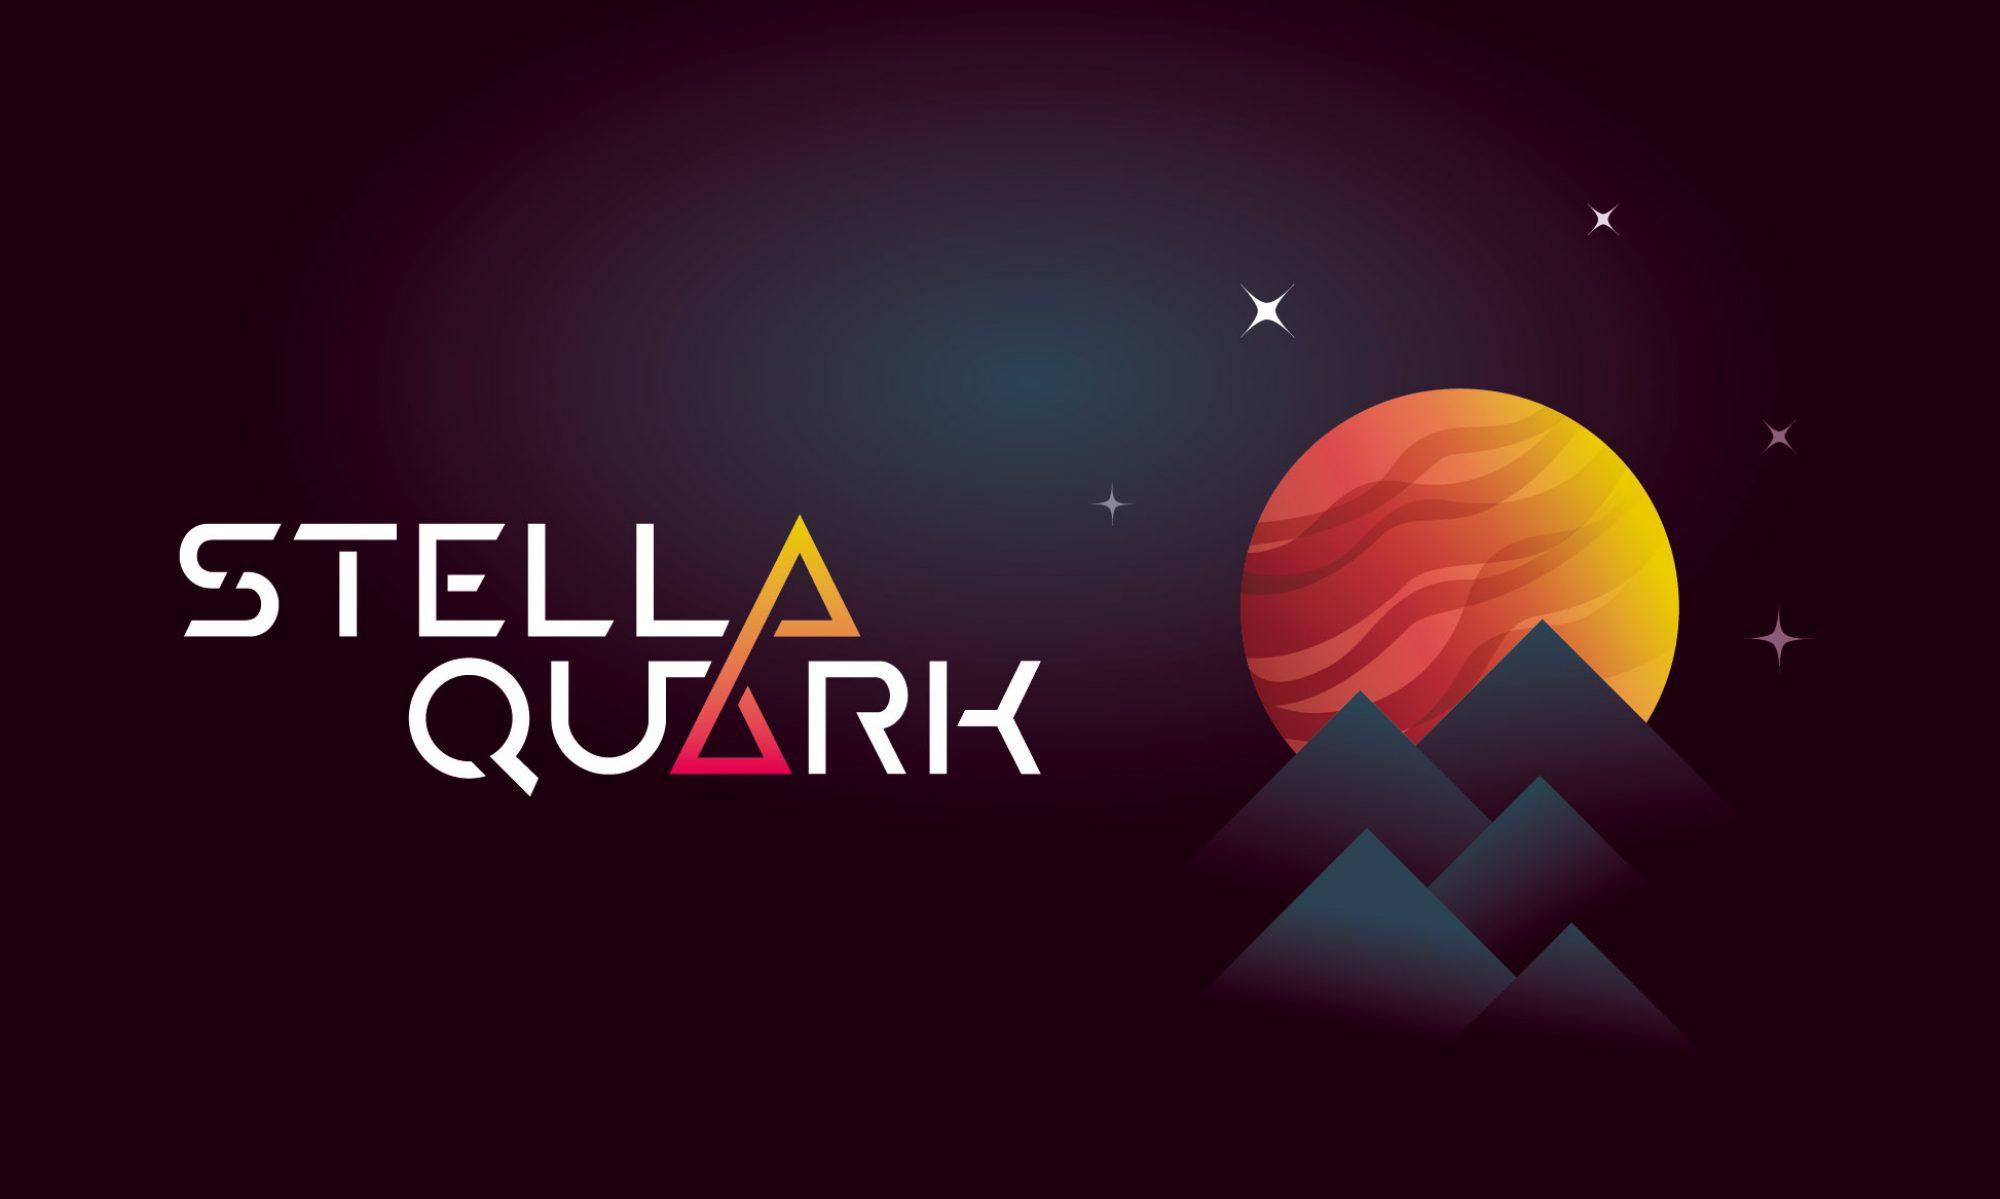 Stella Quark